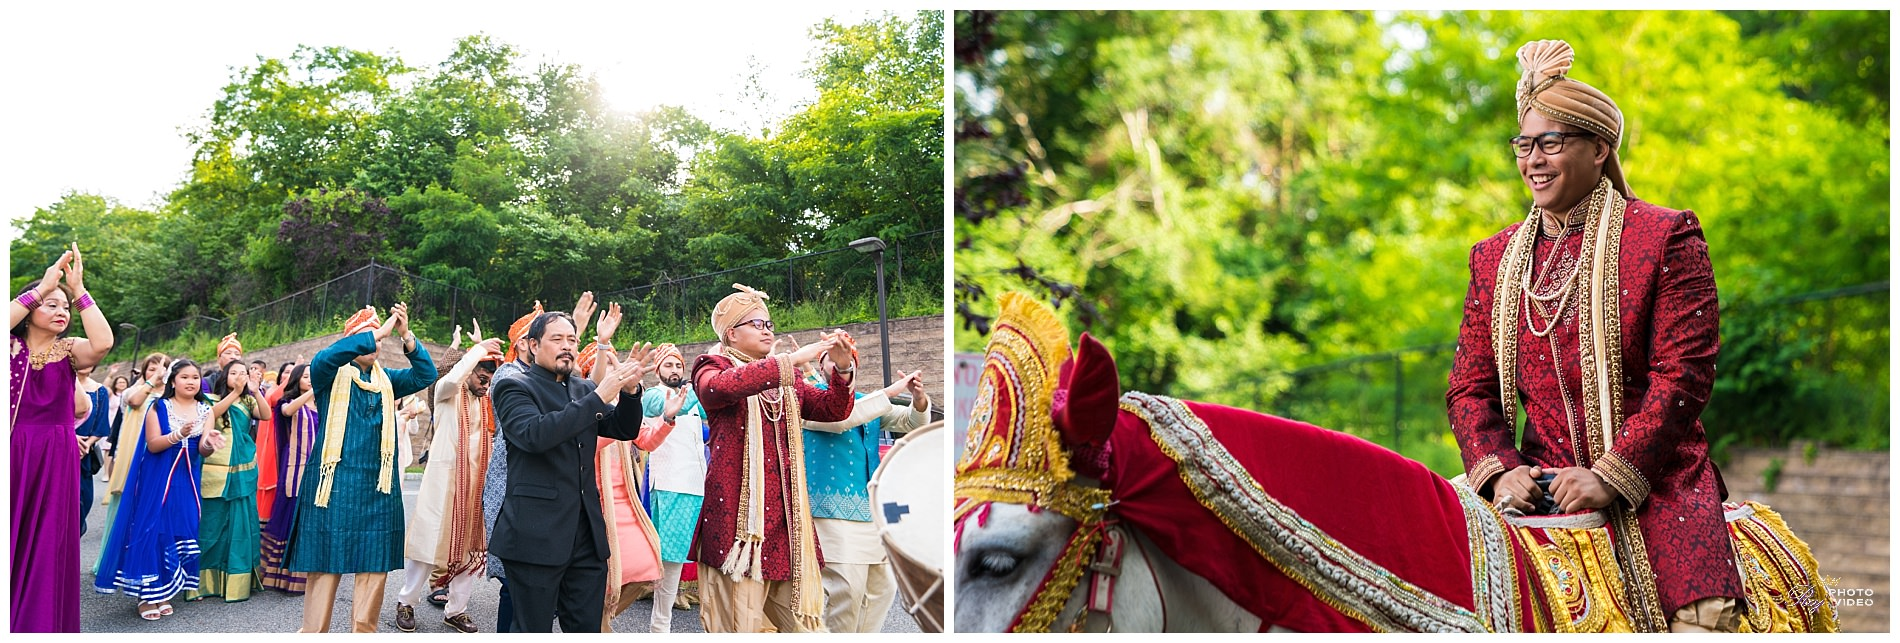 Aashirwad-Palace-Randolph-NJ-Hindu-Wedding-Ceremony-Khusbu-Jeff-4.jpg